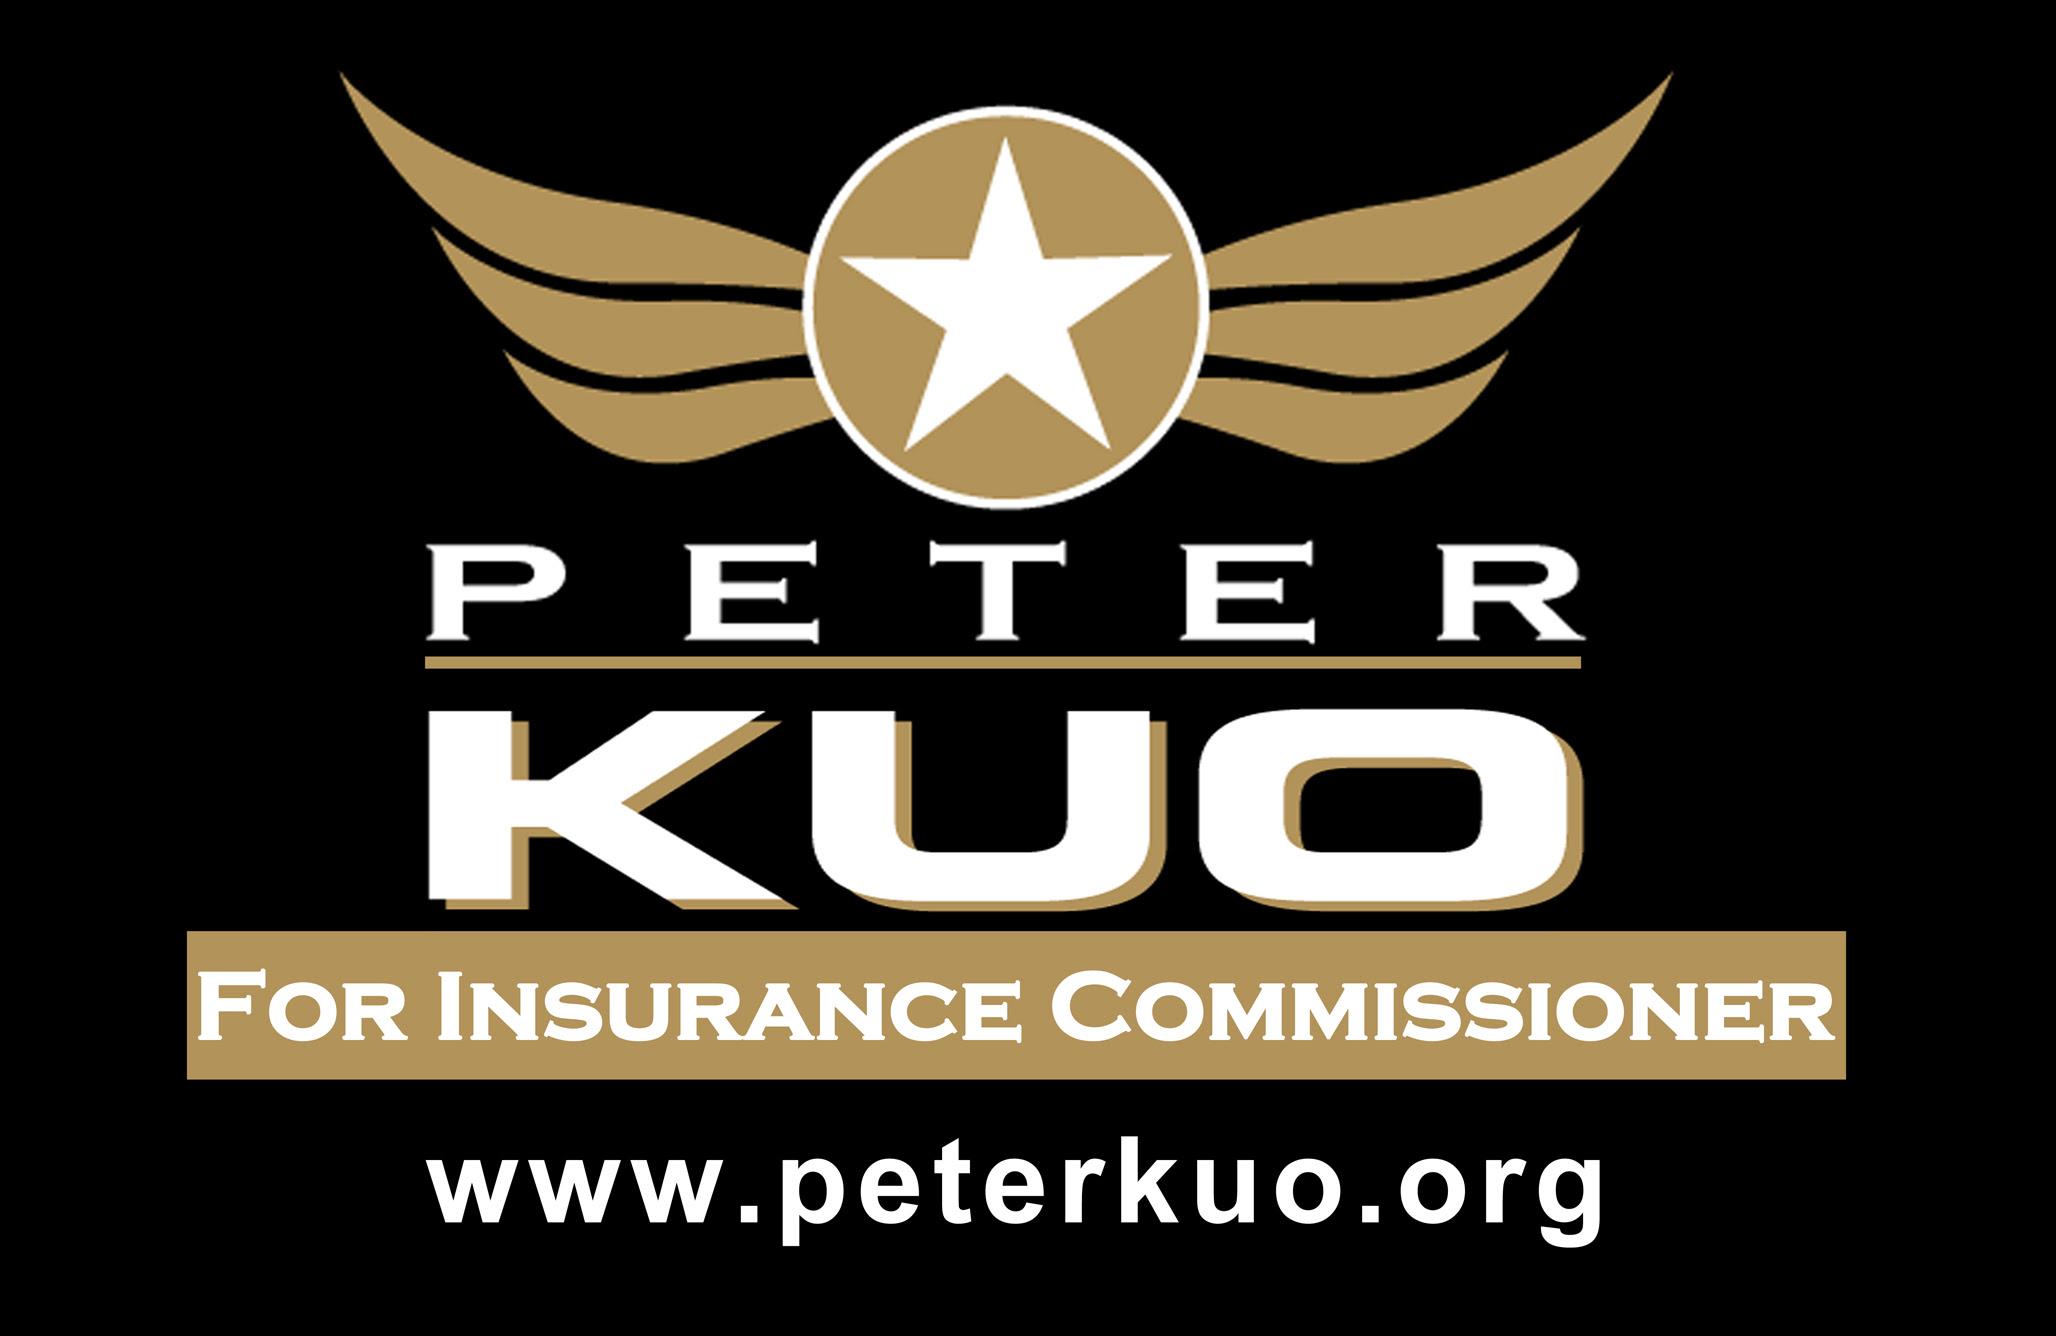 PeterKuo_logo_1005-2017.jpg